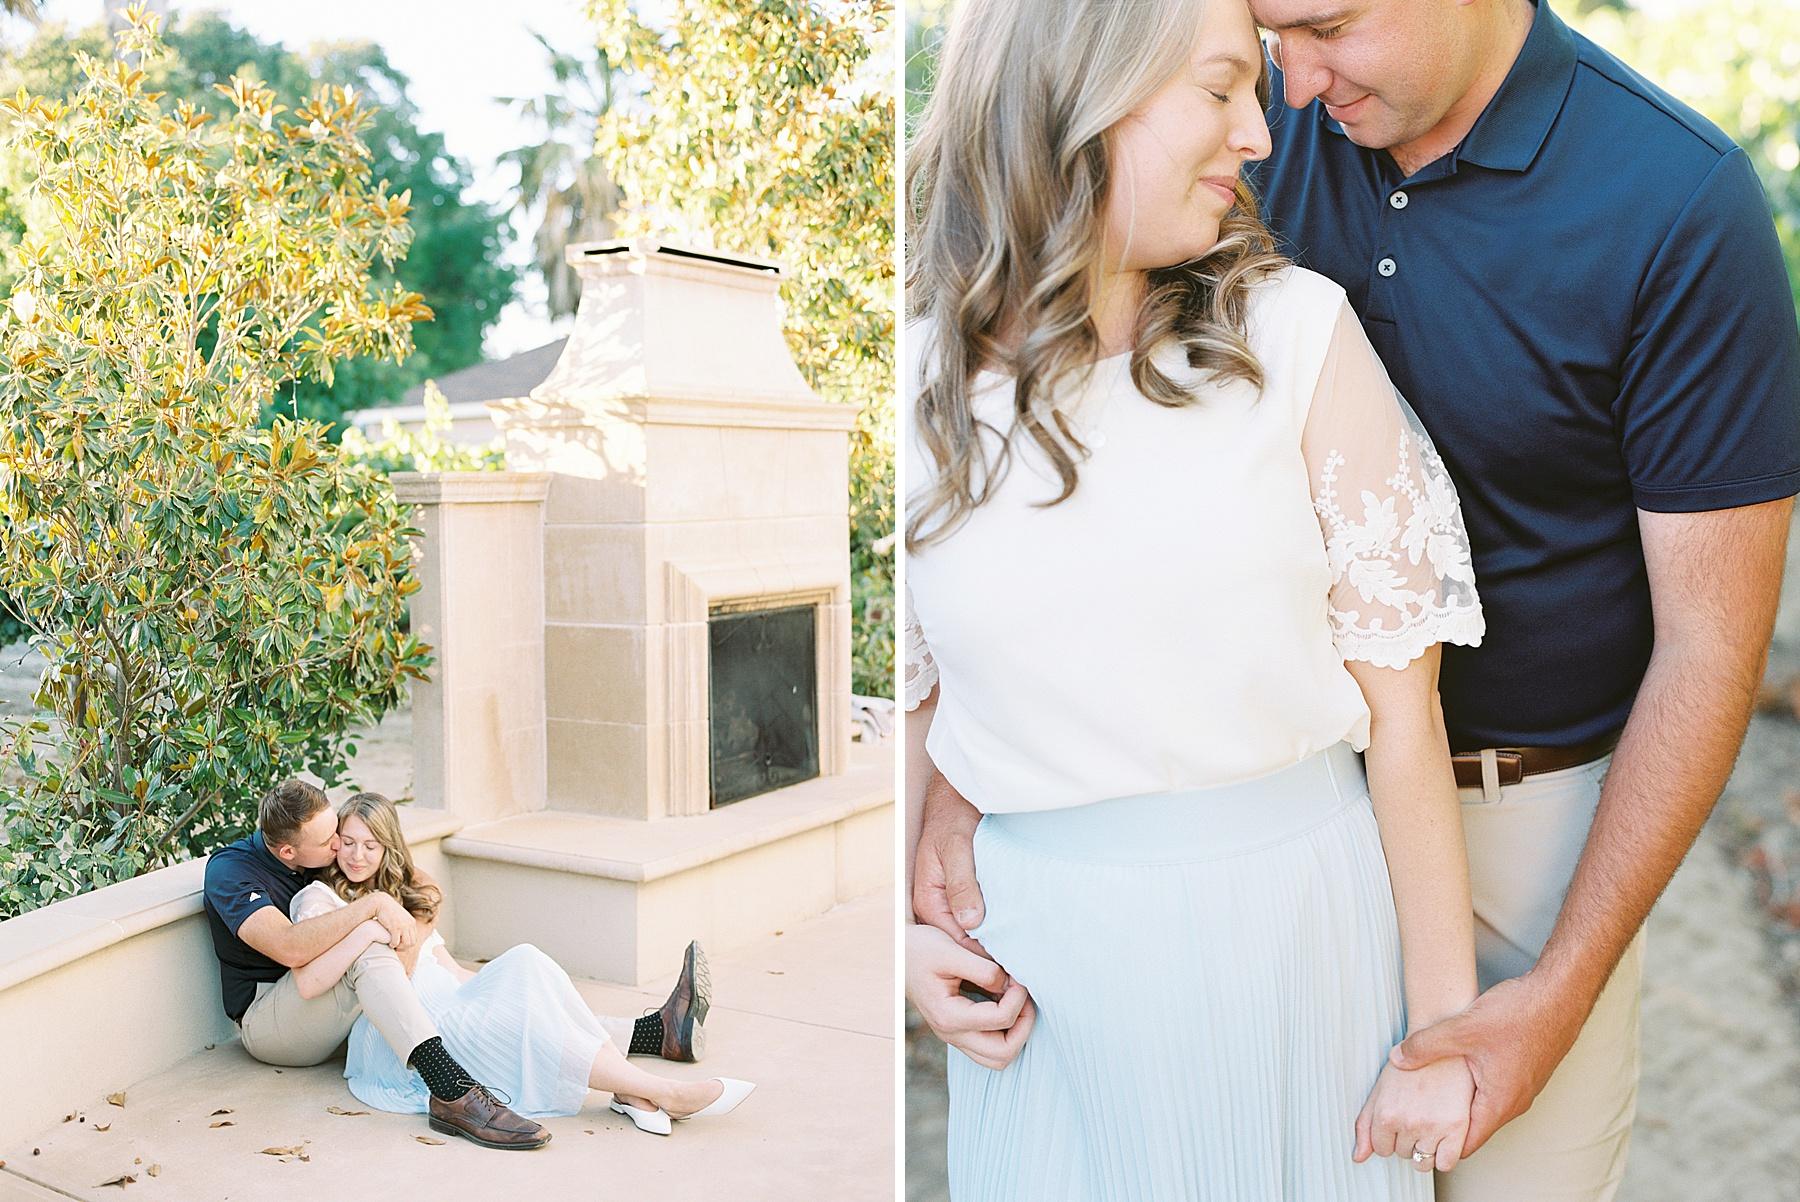 Scribner Bend Winery Engagement Session - Courtney and Steven - Ashley Baumgartner - Sribner Bend Wedding Photographer - Sacramento Wedding Photographer_0018.jpg